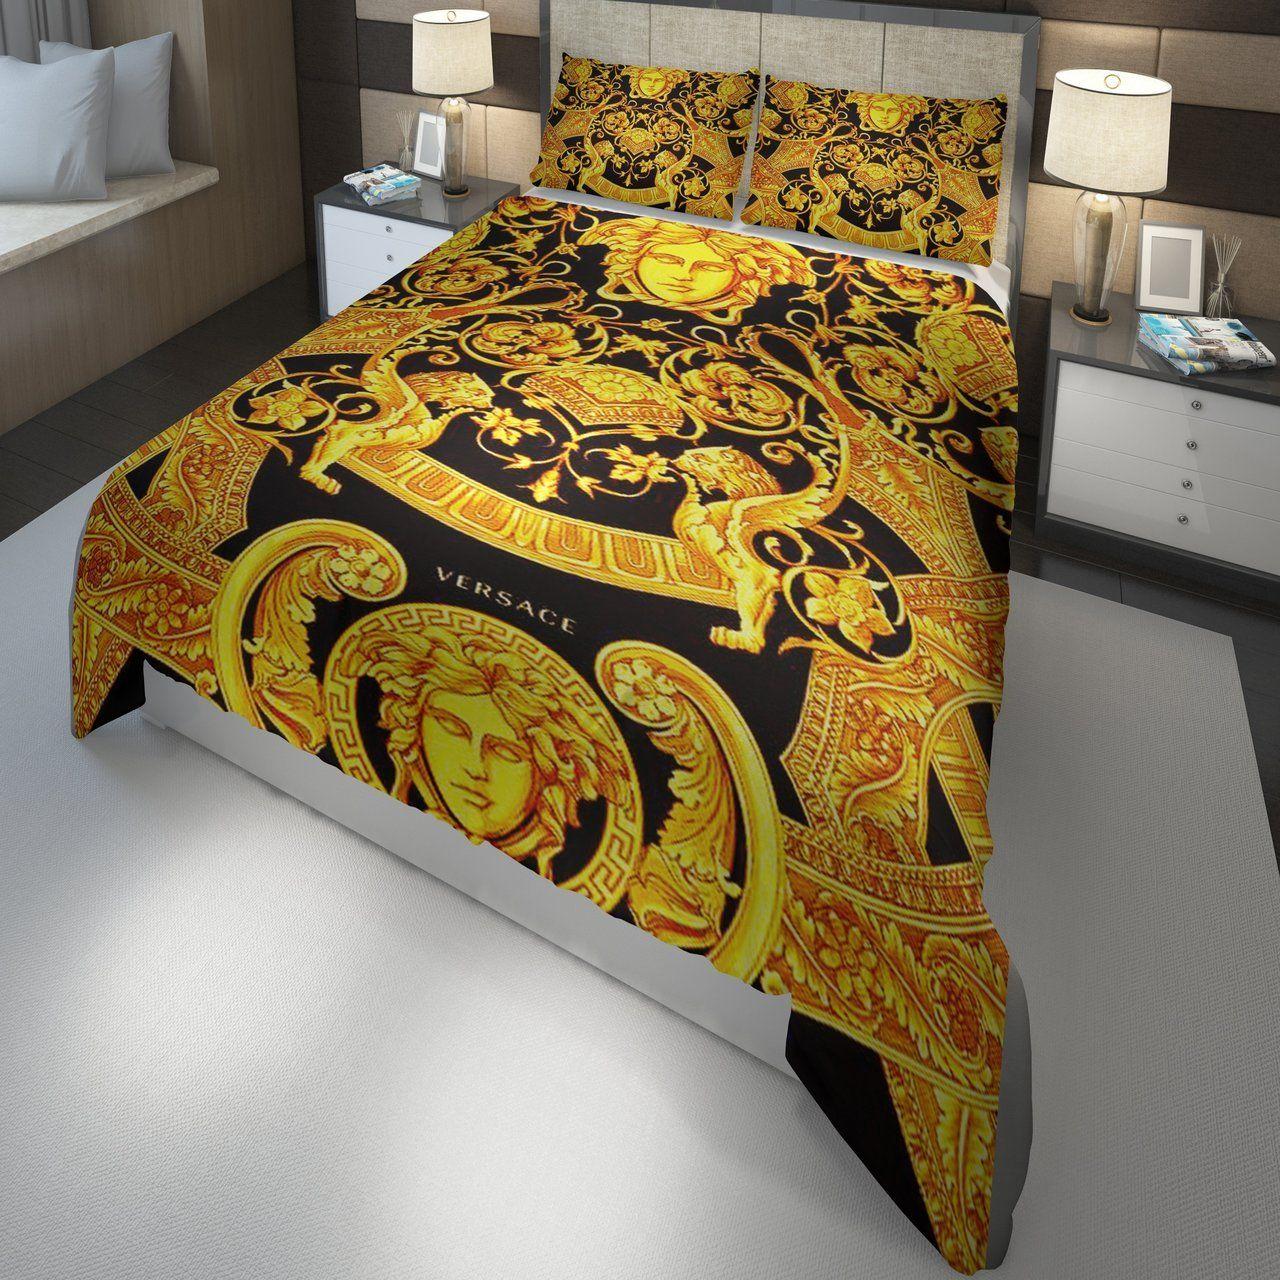 Biancheria Da Letto Versace.Versace Barocco Logo Golden Custom 3d Customized Bedding Sets Duvet Cover Bedlinen Bed Set Set Di Biancheria Da Letto Idee Letto Copripiumino